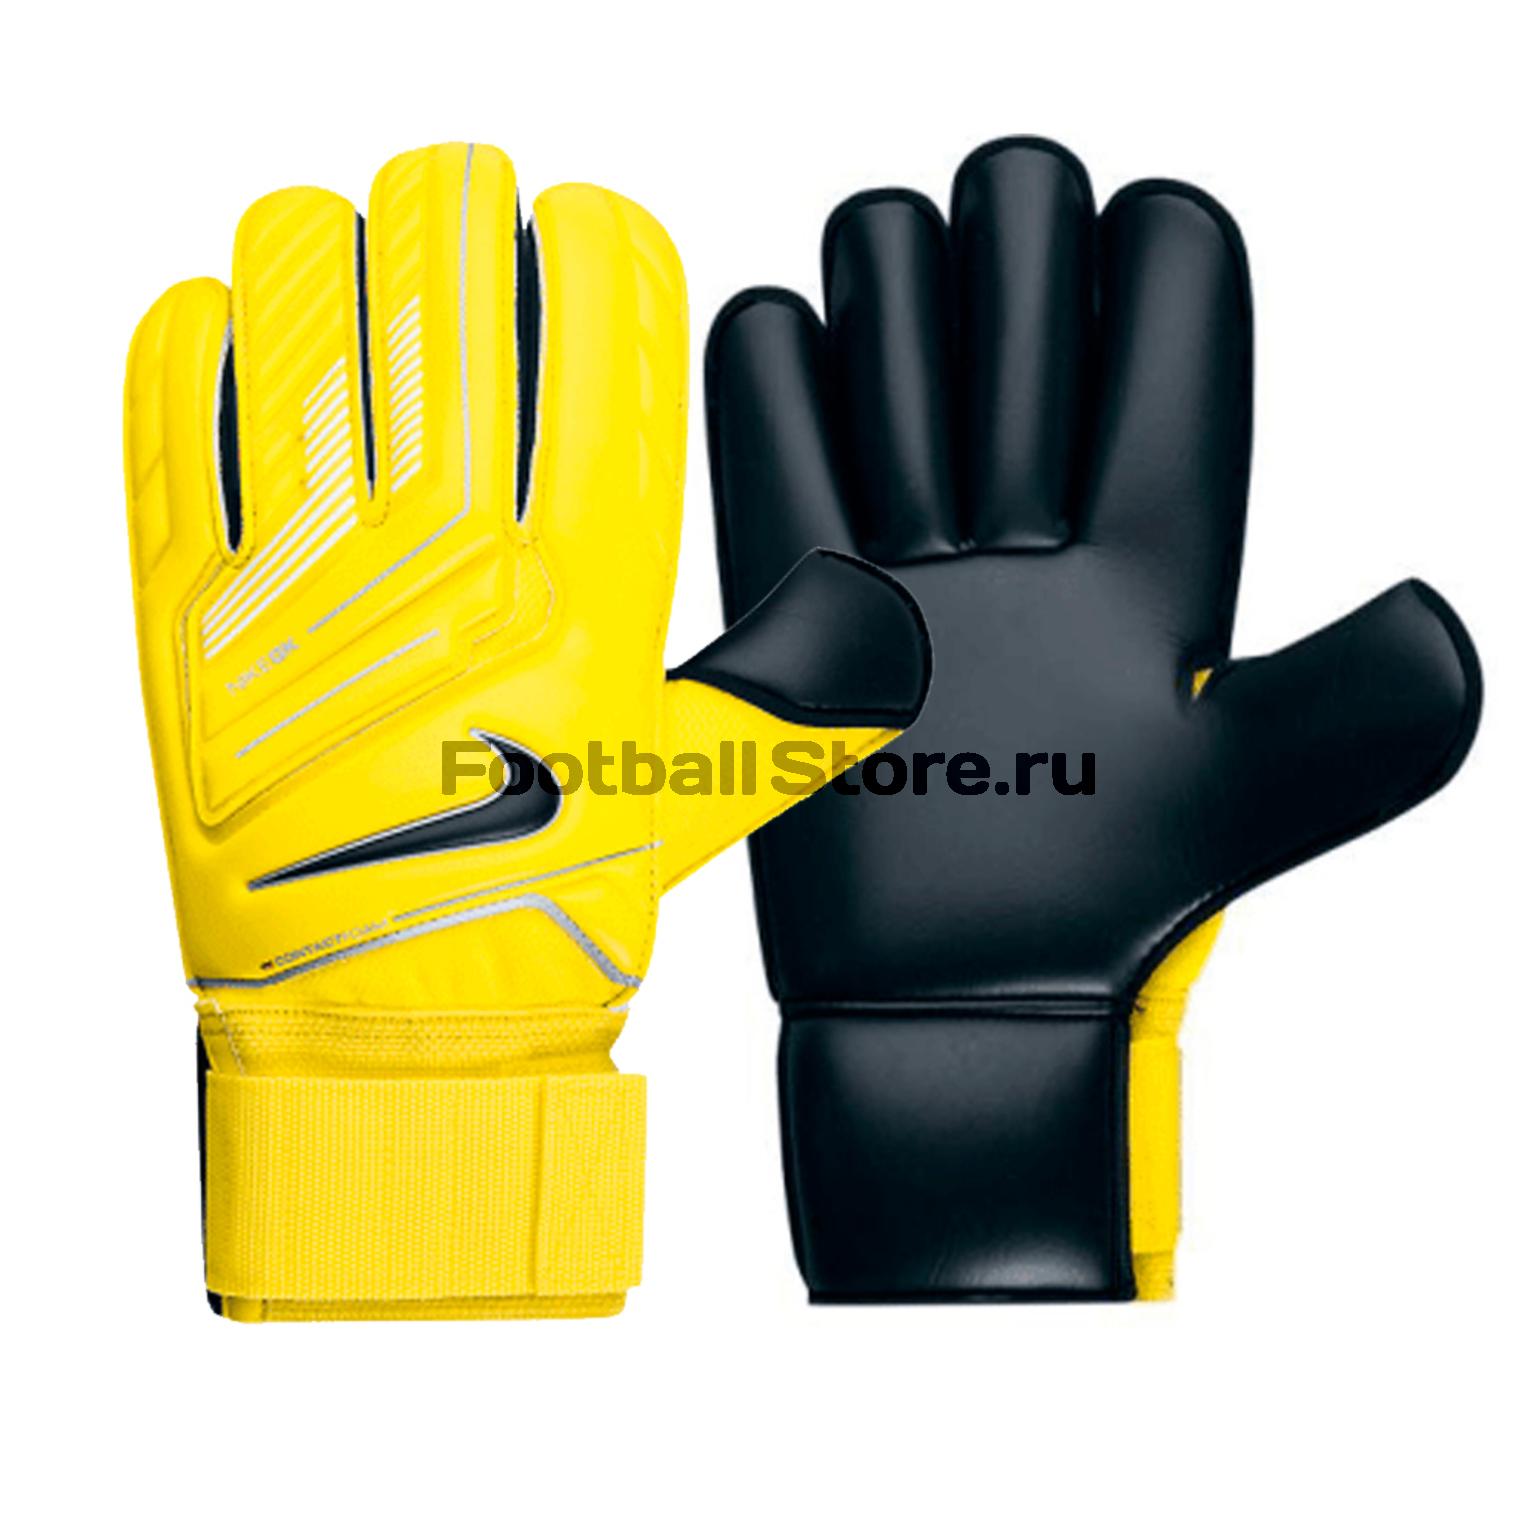 Перчатки Nike Перчатки вратарские Nike GK Gunn Cut GS0254-770